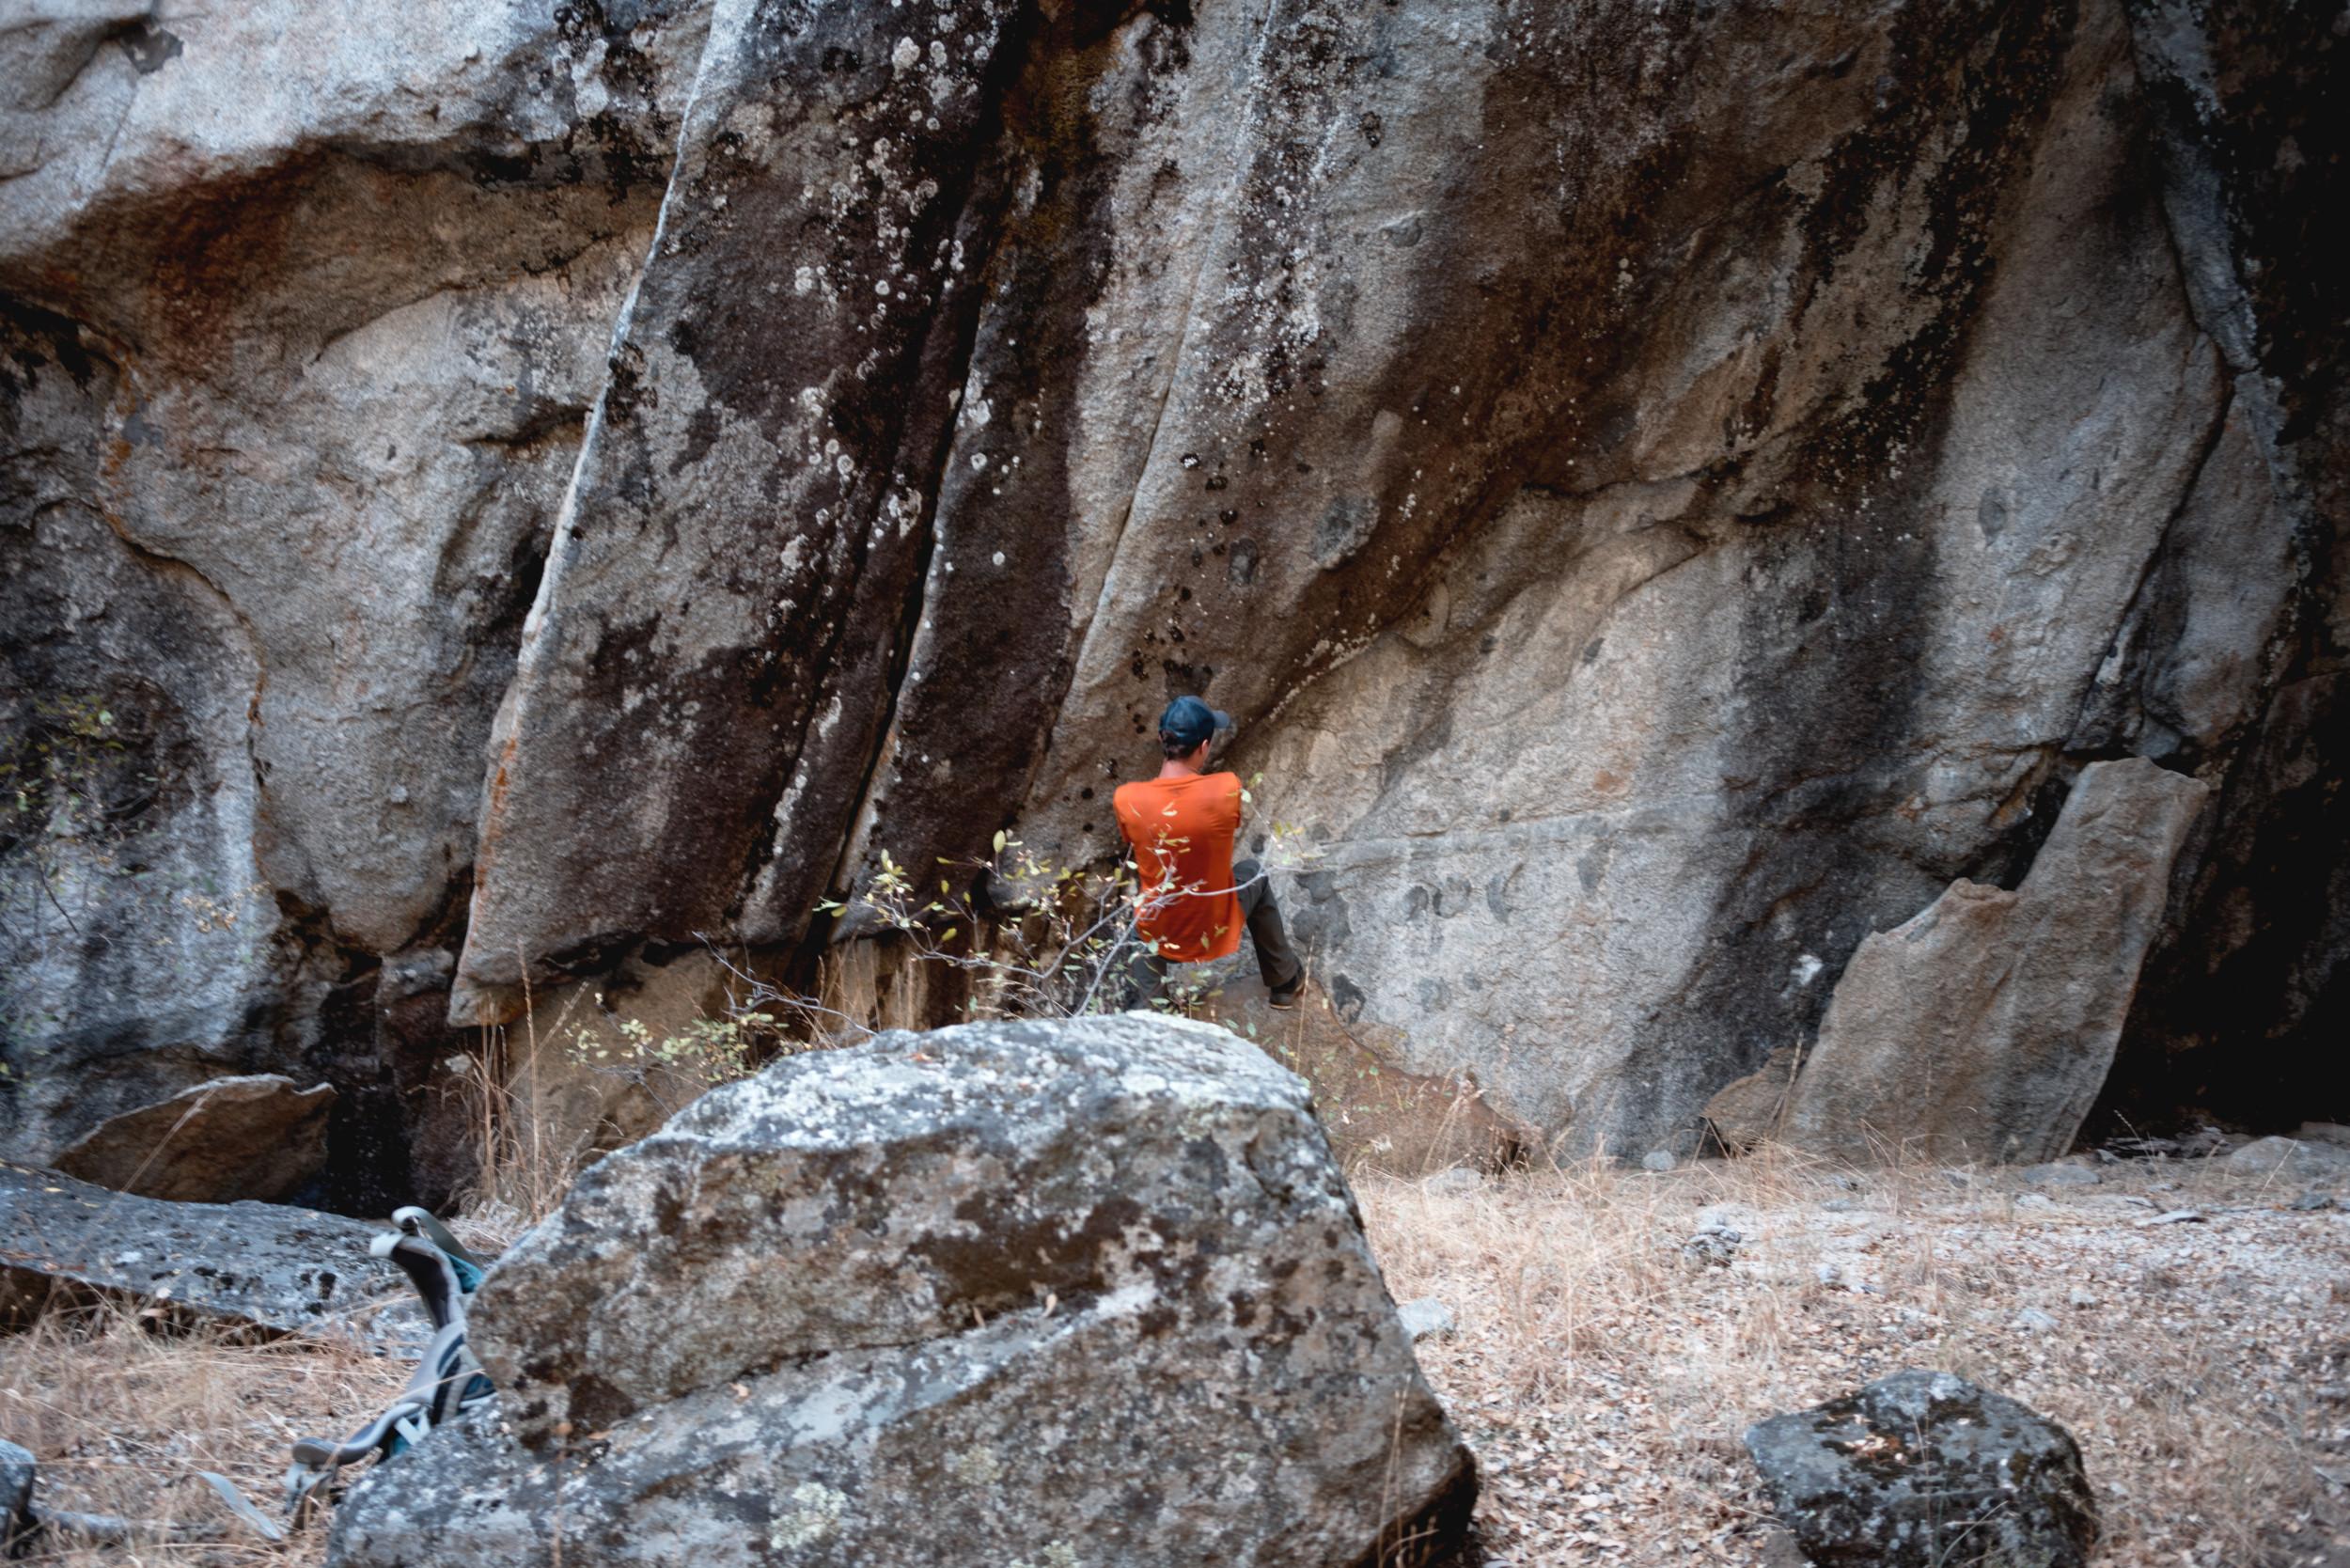 tuolumne-county-adventure-yosemite (148).jpg